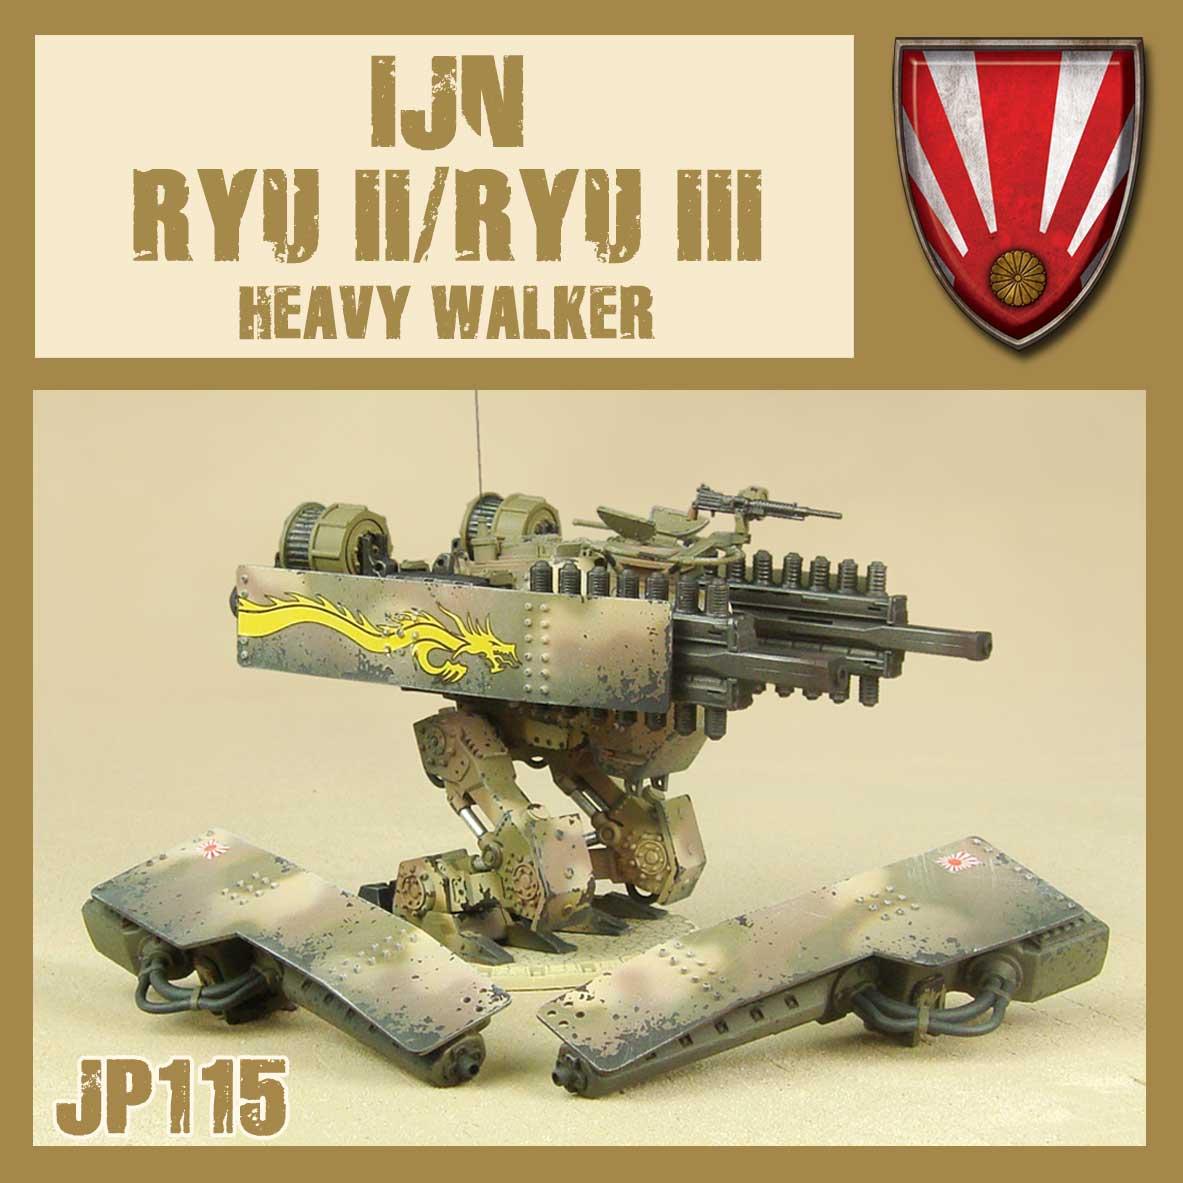 IJN first heavy walker with dual heavy lasers or dual railgun.